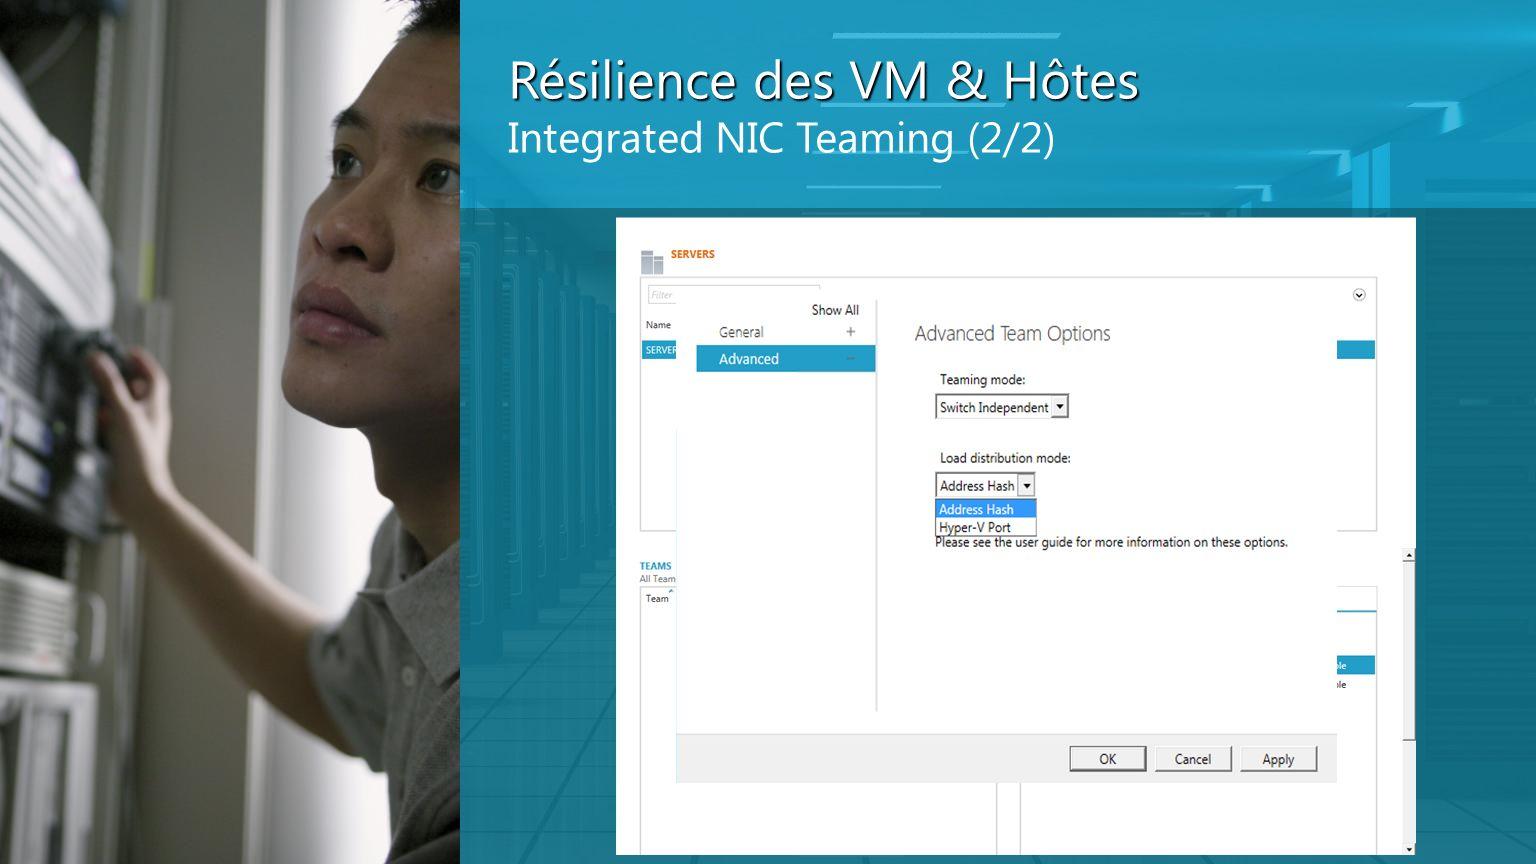 Résilience des VM & Hôtes Integrated NIC Teaming (2/2)